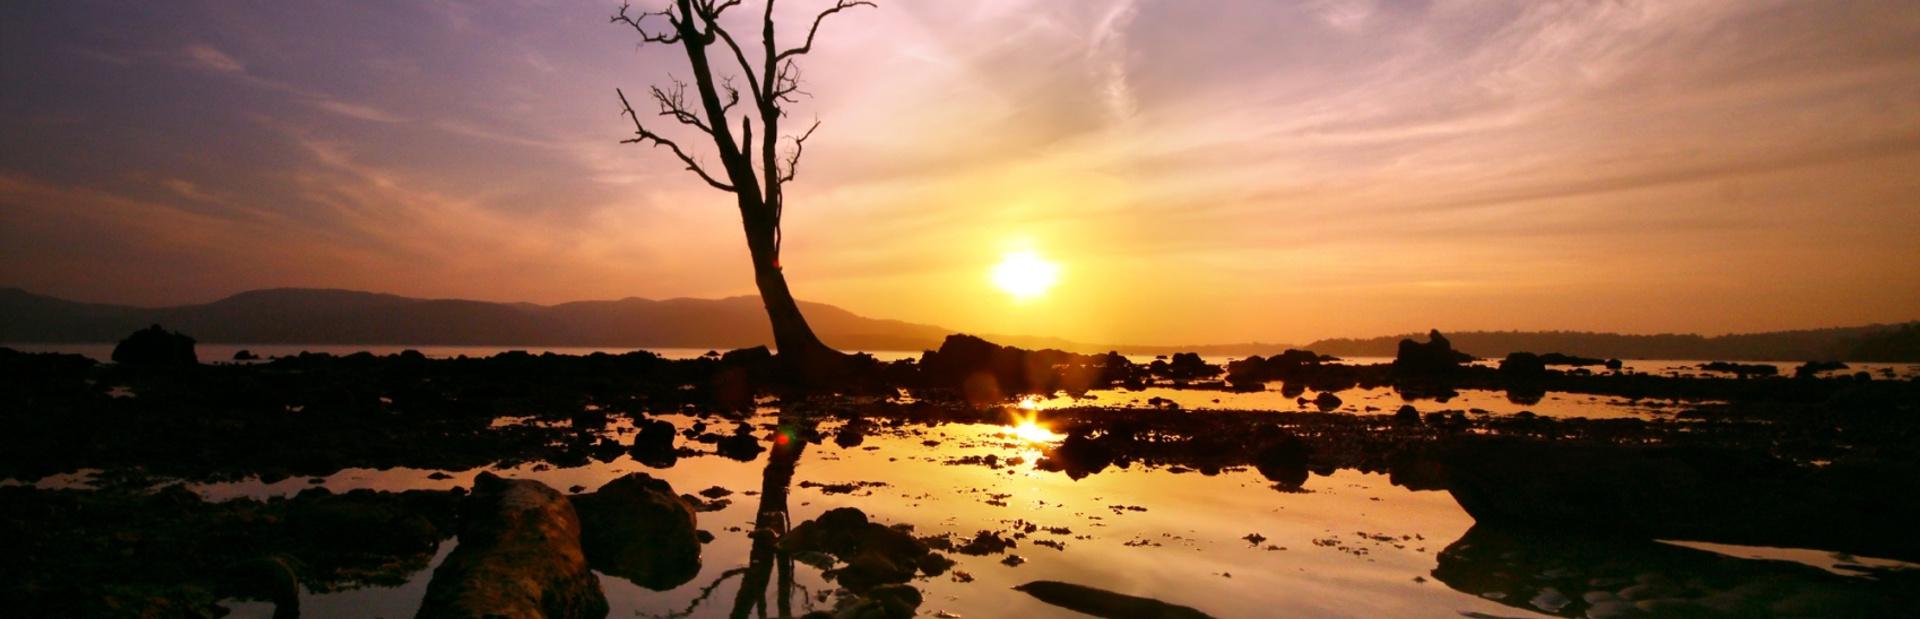 Andaman Islands news photo